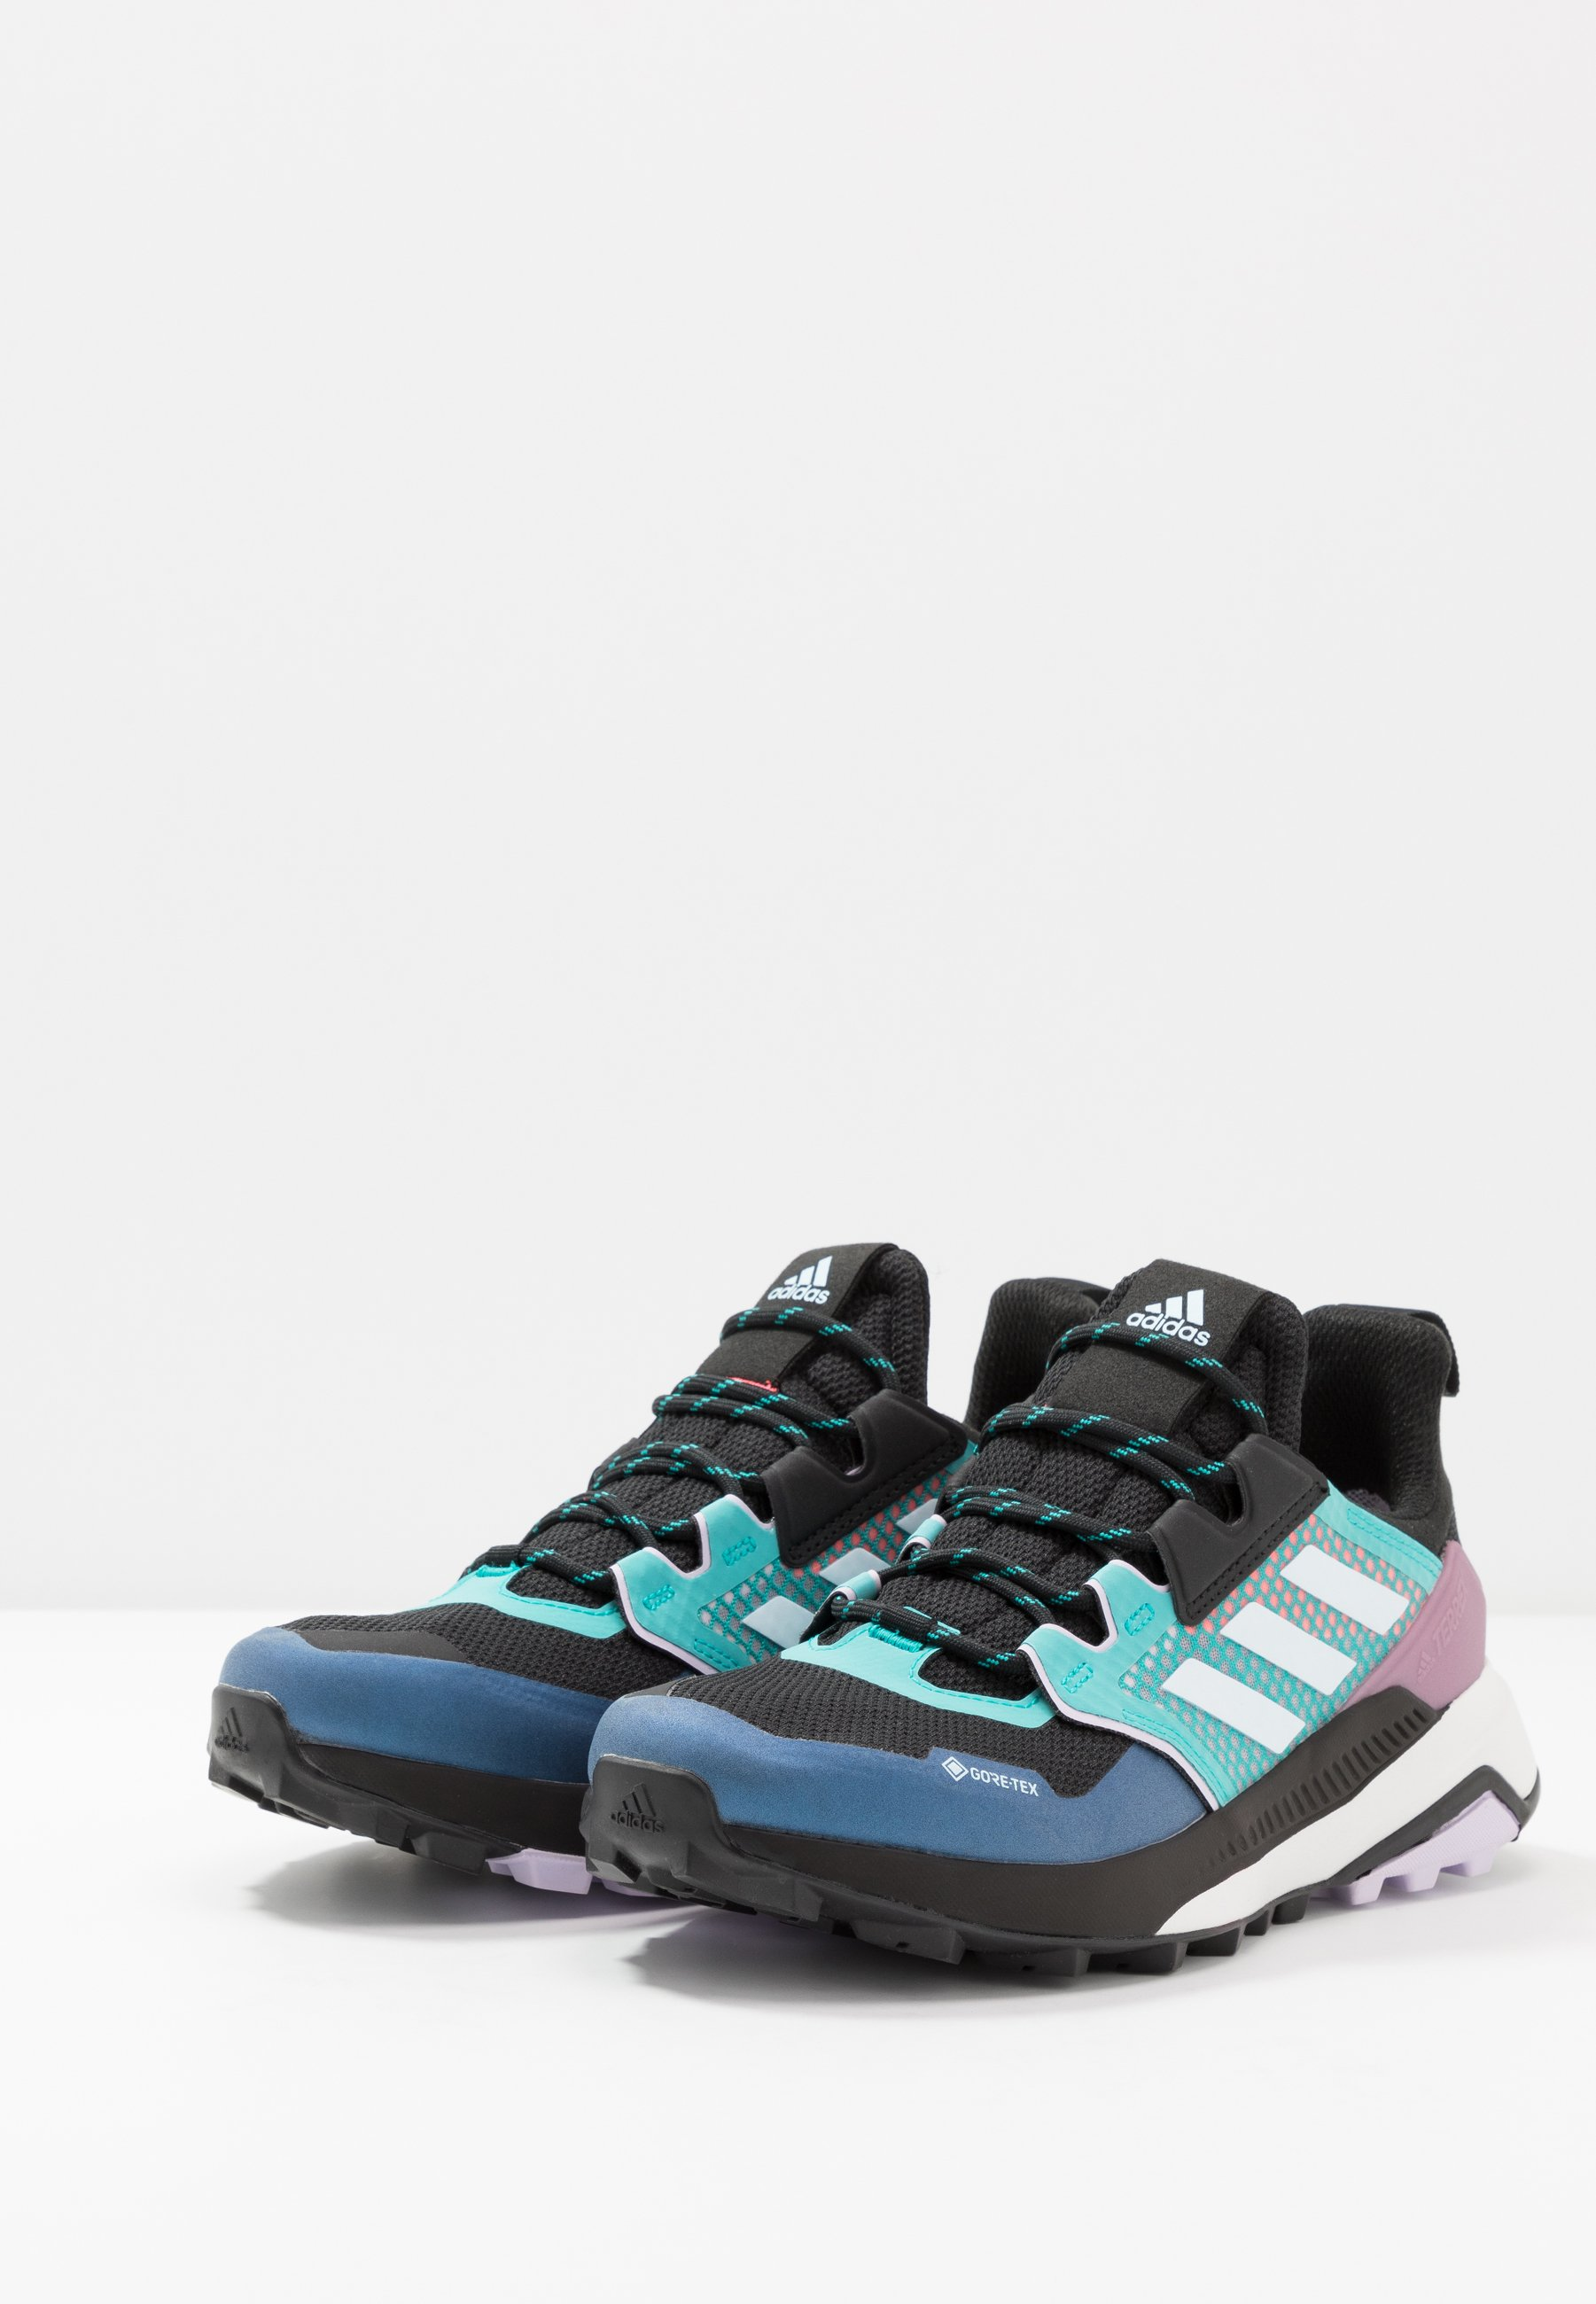 adidas TERREX TRAILMAKER GORE TEX WANDERSCHUHE Hikingschuh core blacksky tintpurple tint